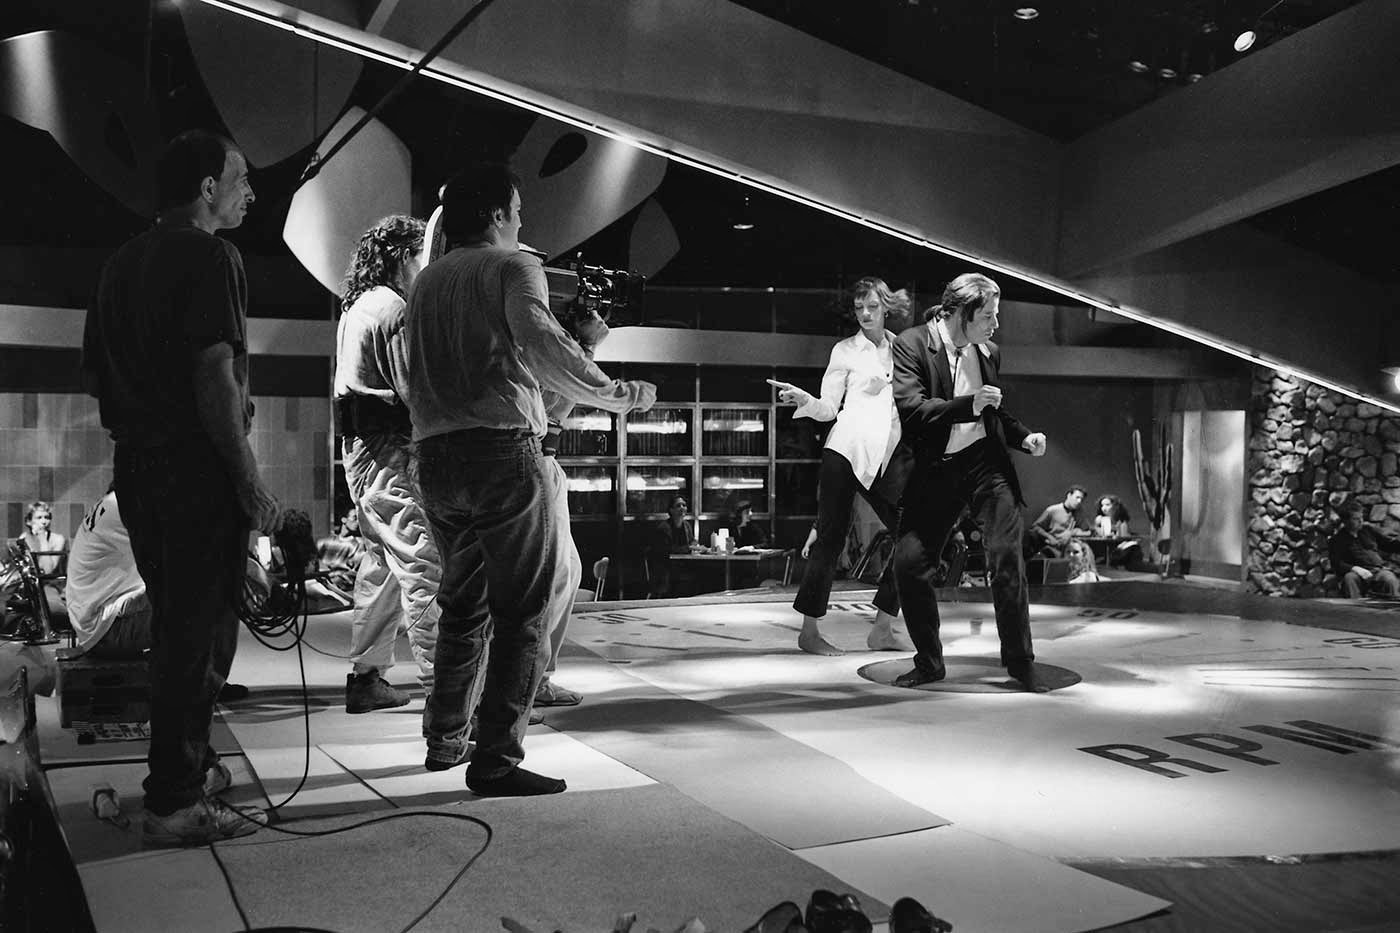 Pulp Fiction detrás de las cámaras baile